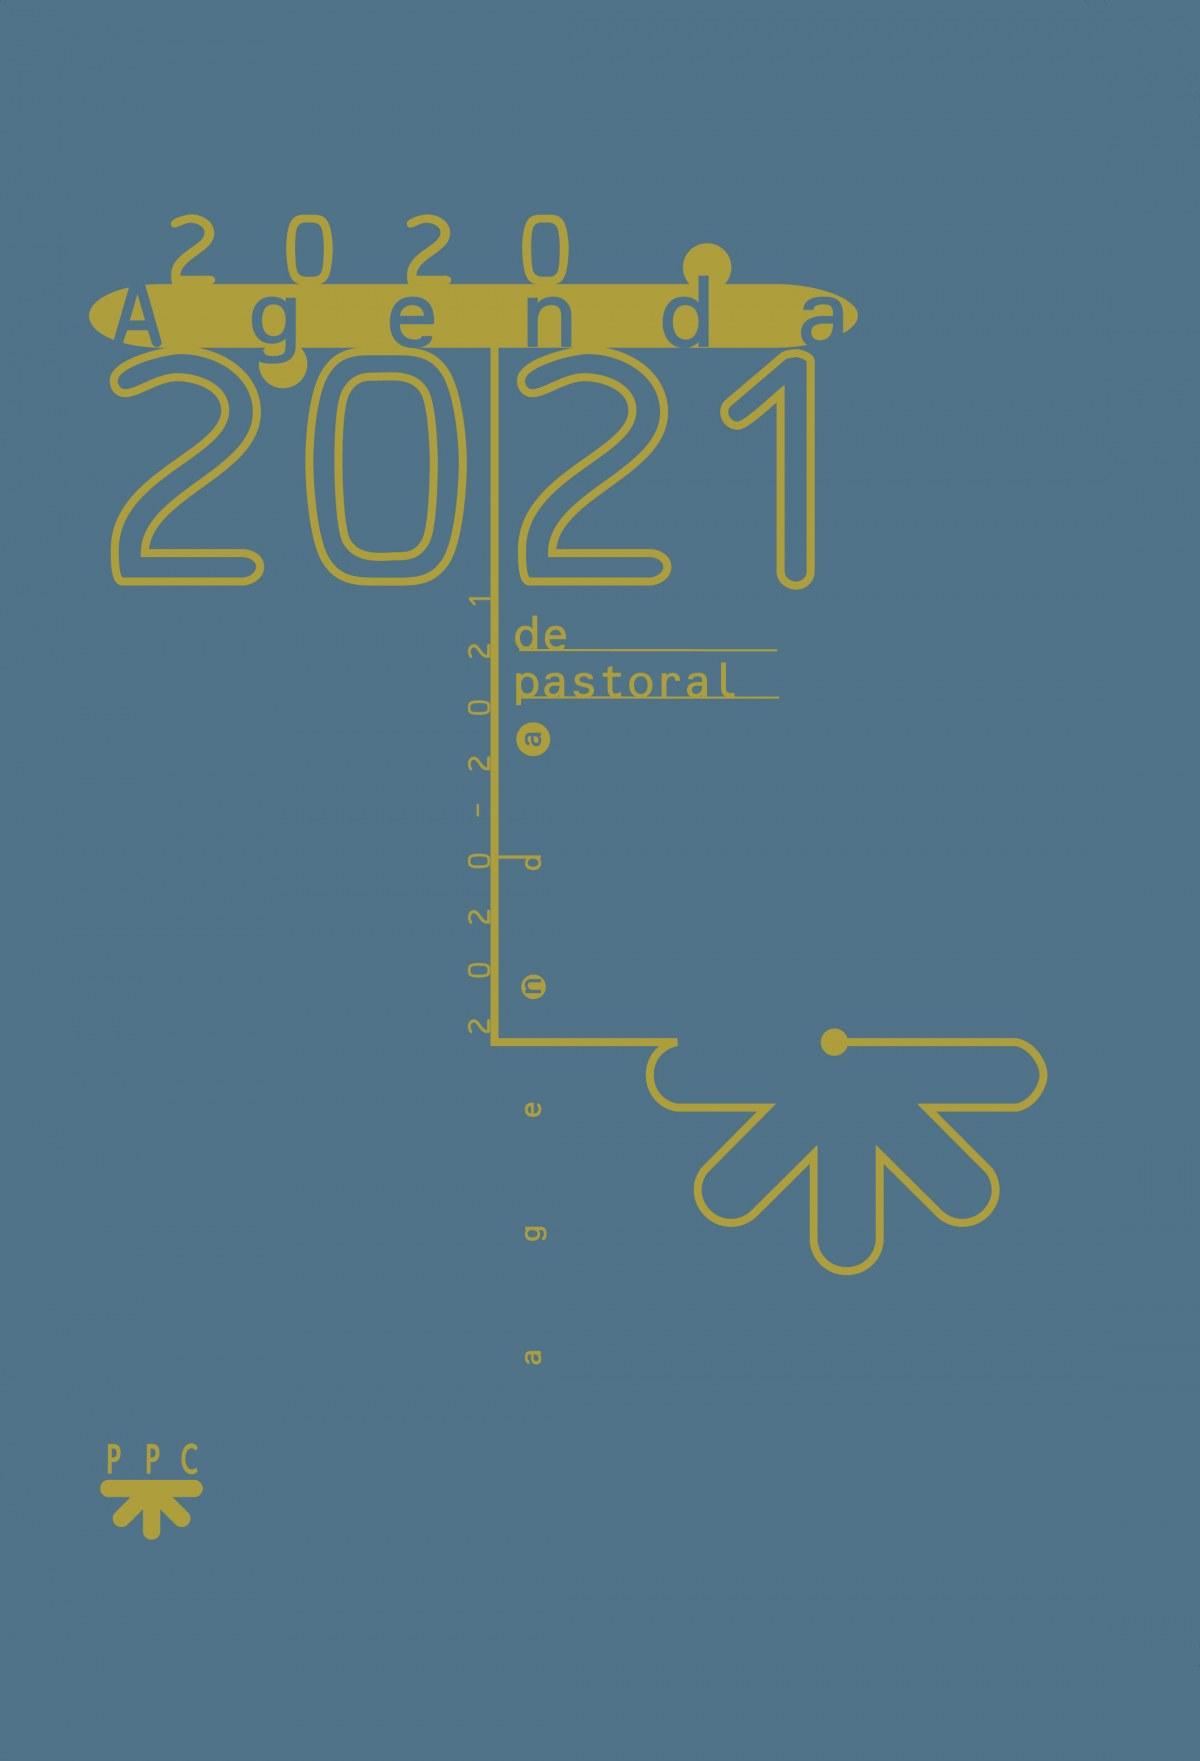 Agenda de Pastoral 2020-2021